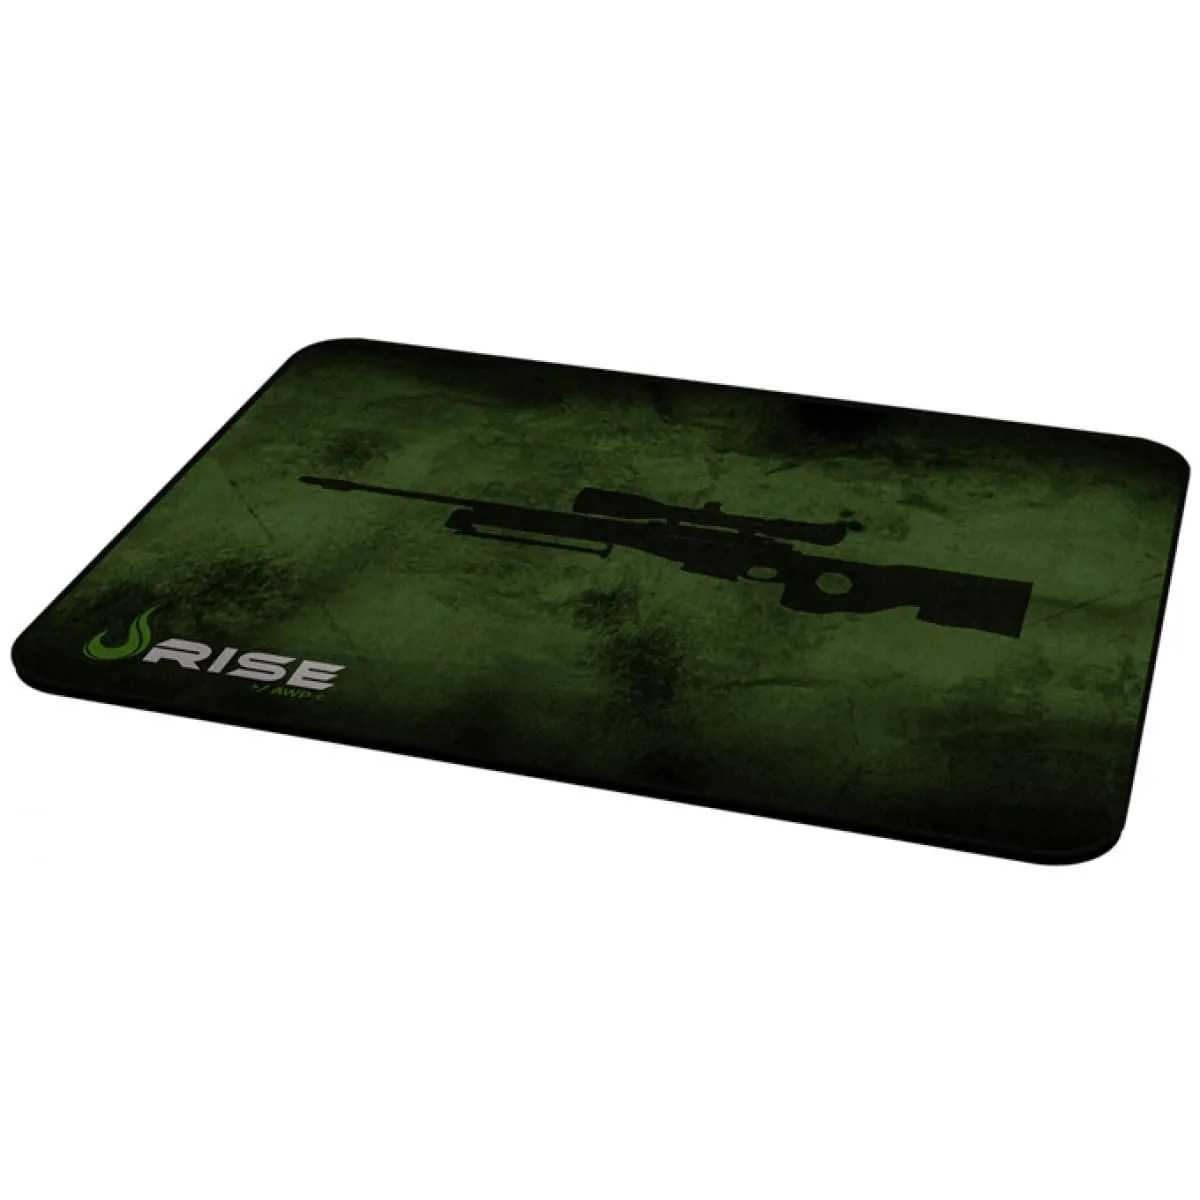 MousePad Gamer Rise Médio 21x29cm Mode Sniper RG-MP-04-SNP